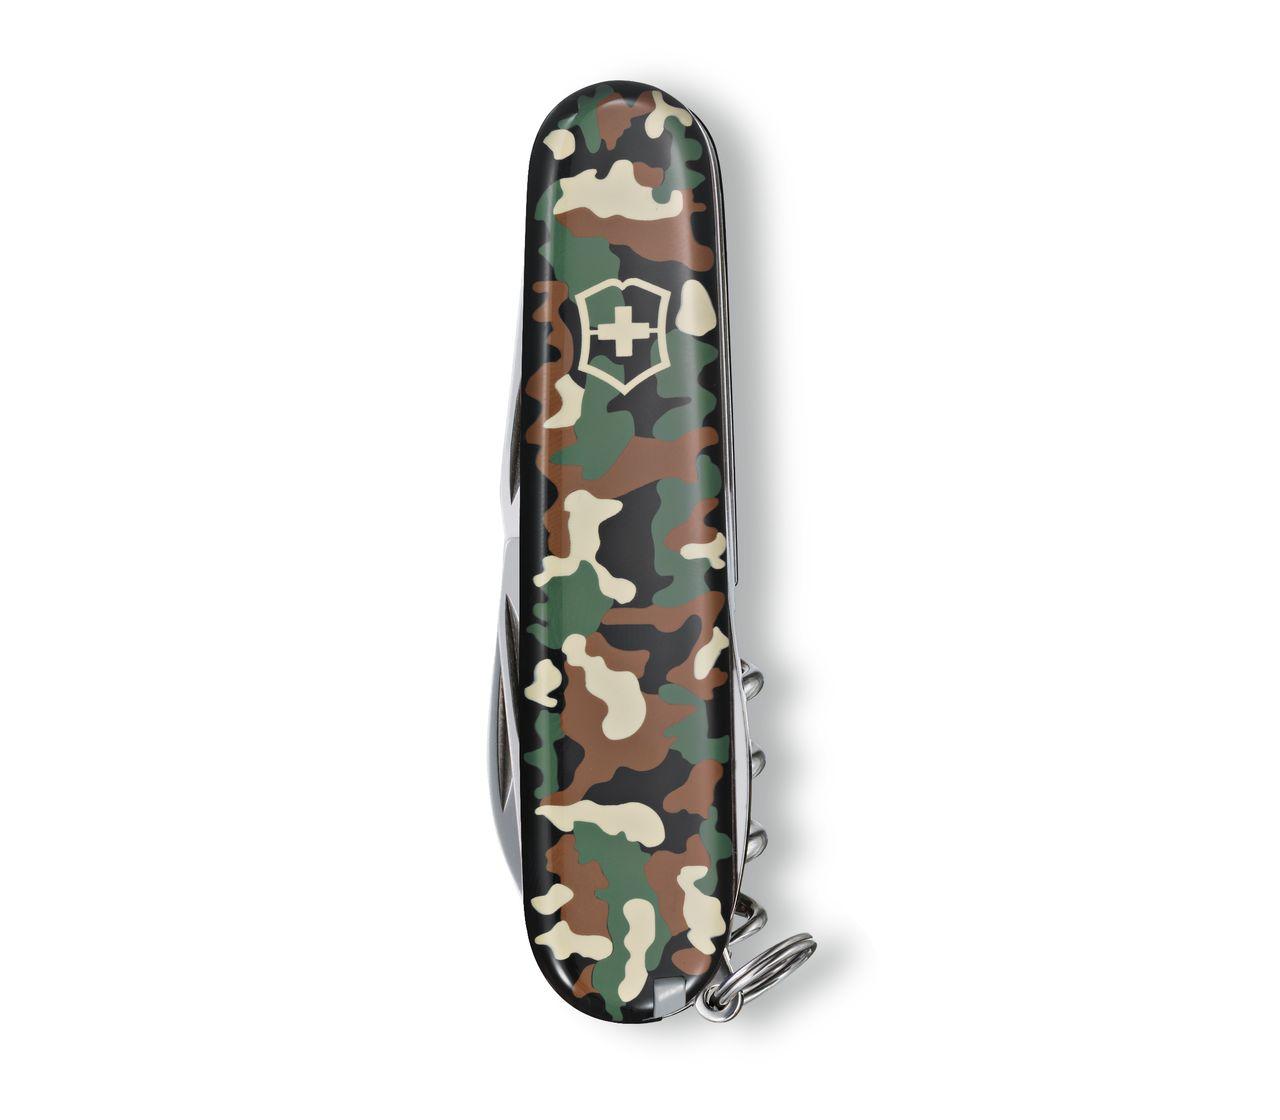 Victorinox Spartan In Camouflage 1 3603 94